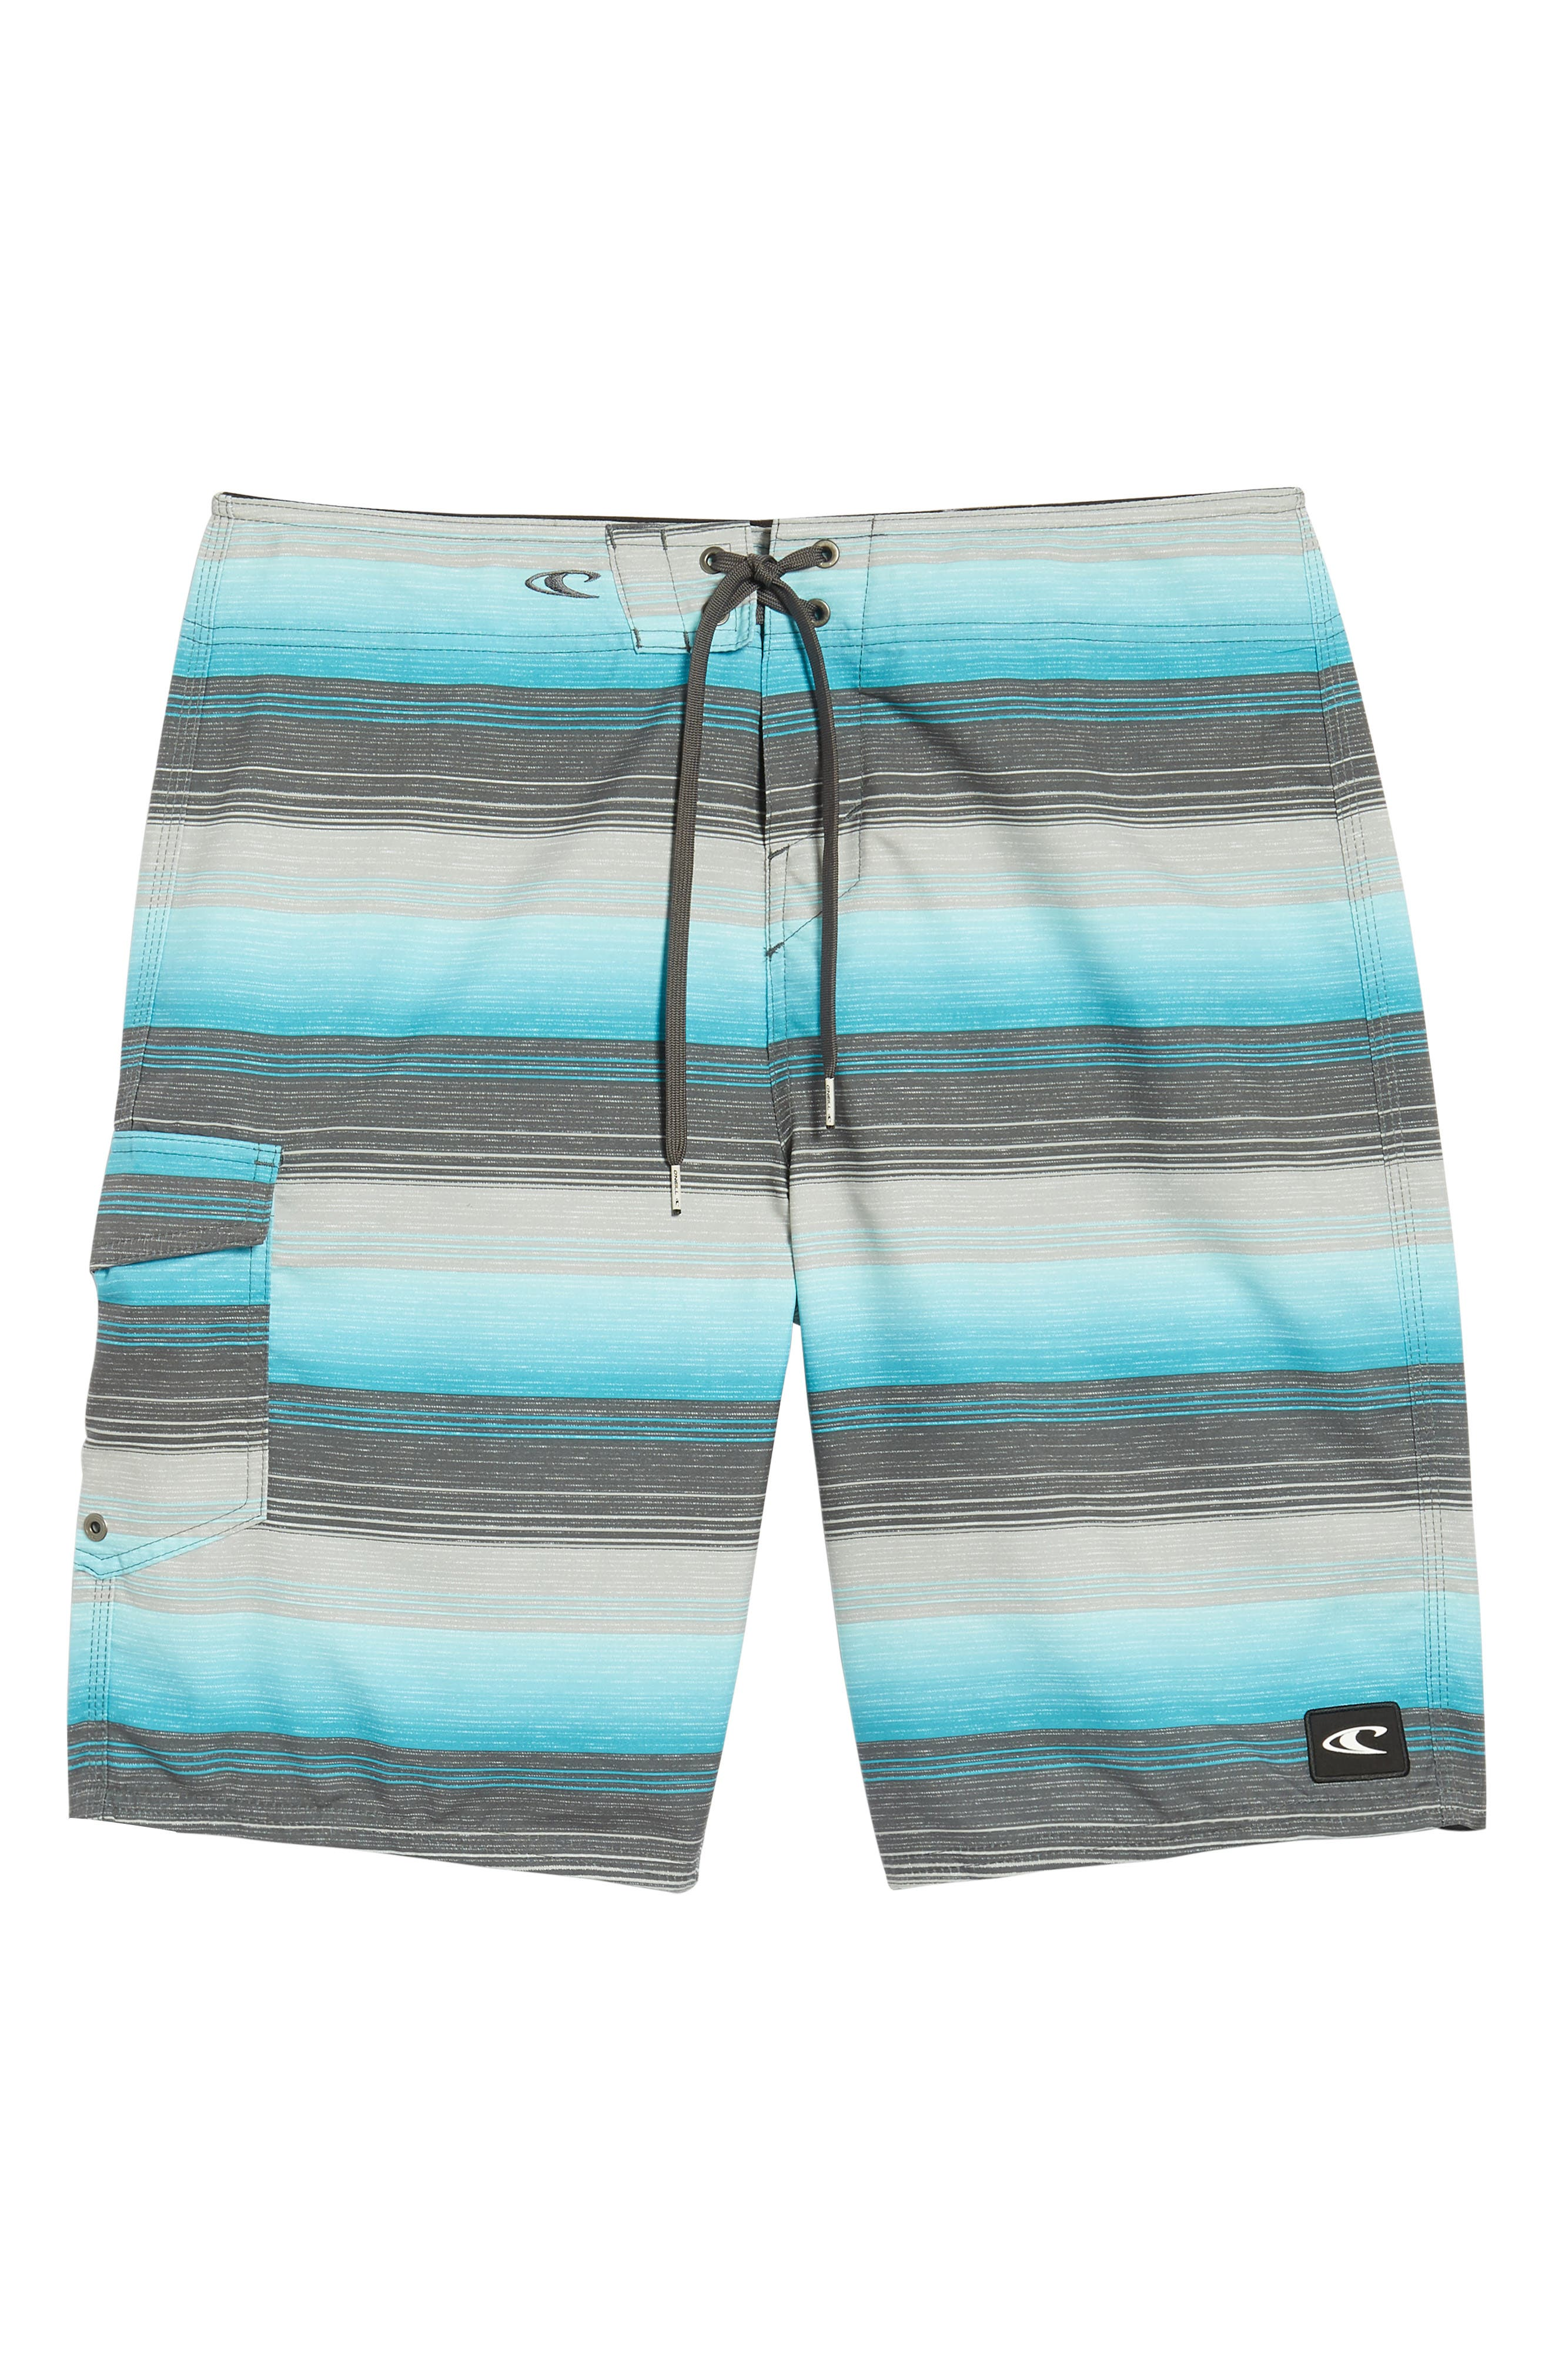 Santa Cruz Board Shorts,                             Alternate thumbnail 6, color,                             Ocean